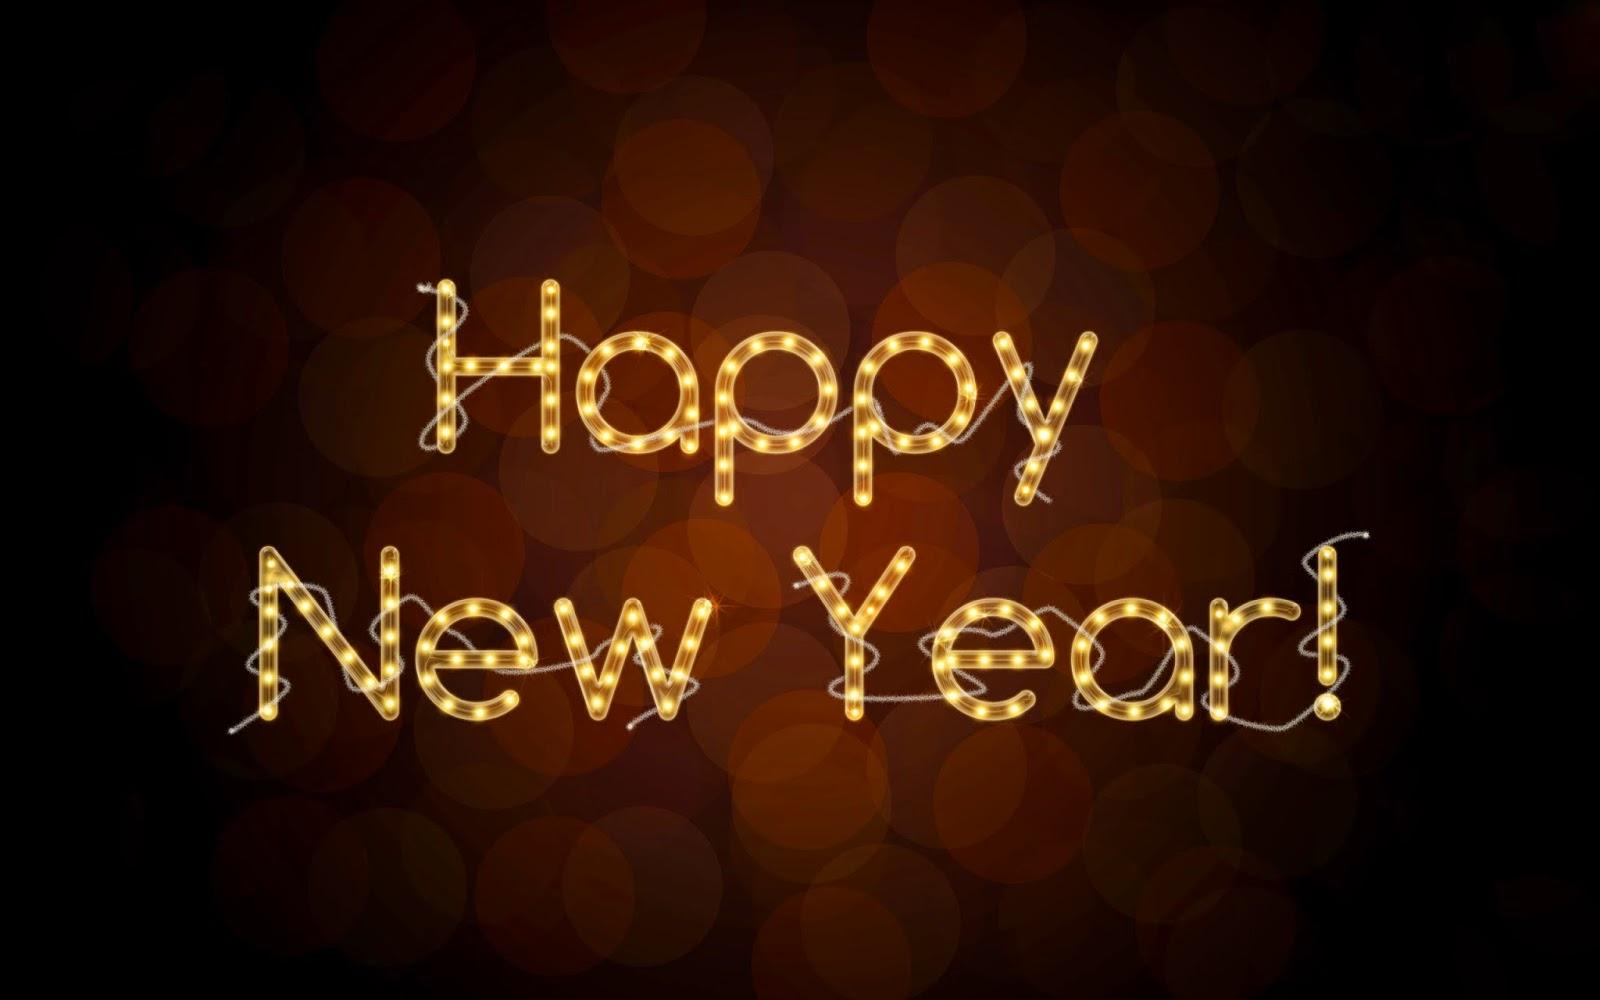 Hd Happy new year wallpaper (Wallpaper groups)